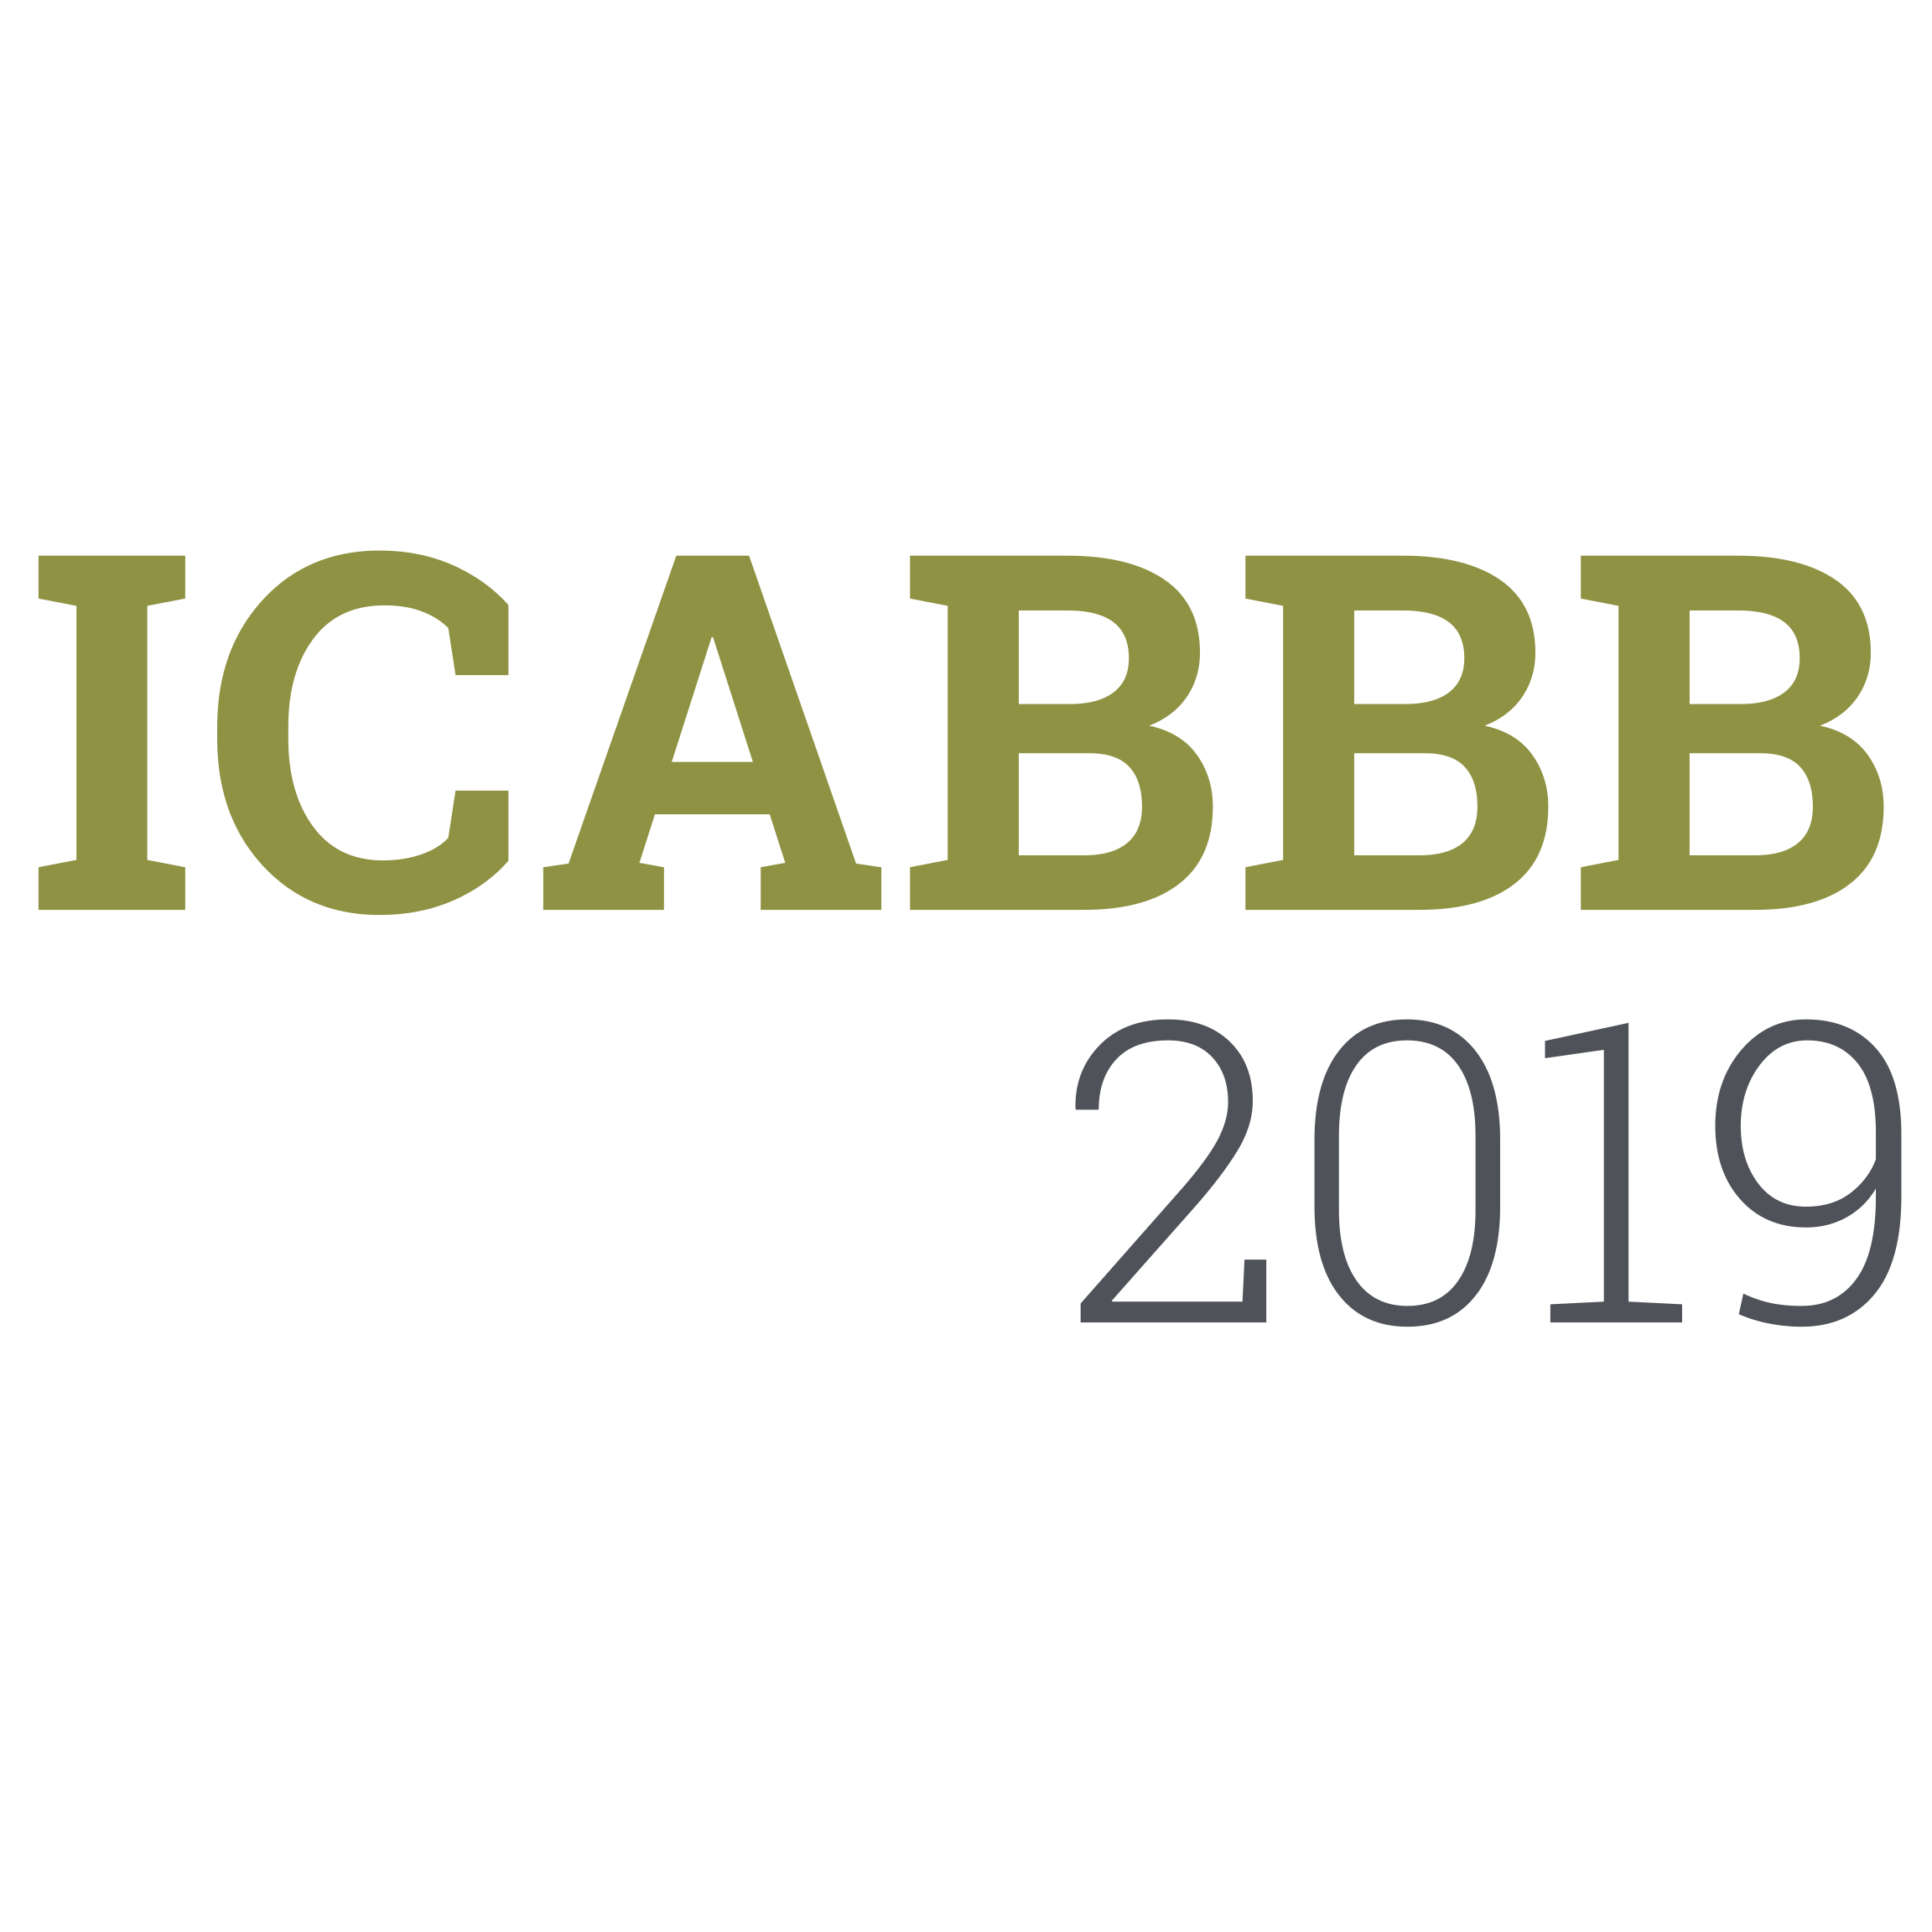 ICABBB